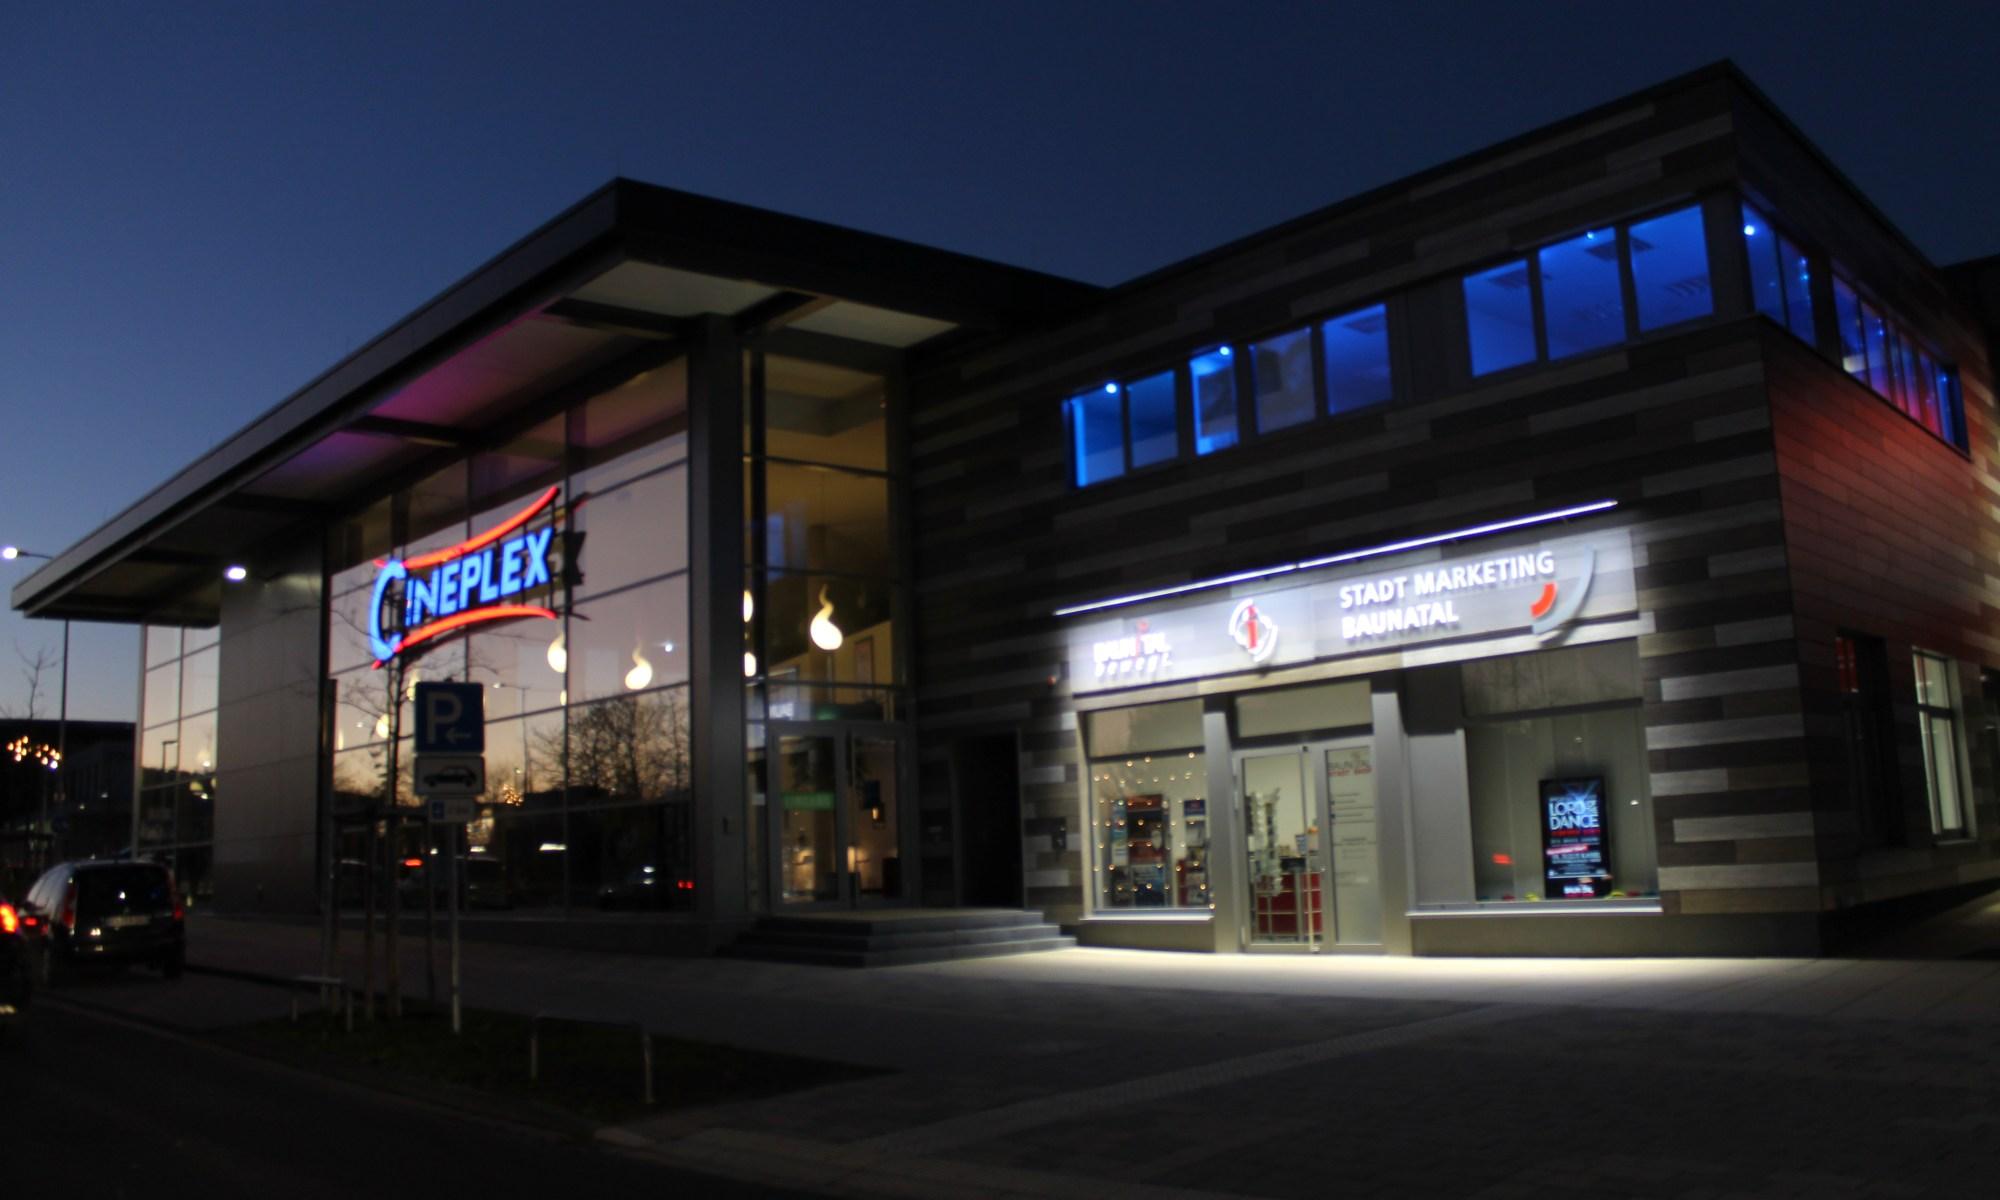 Cineplex Baunatal, STadtmarketing Baunatal, Foto: Stadtmarketing Baunatal